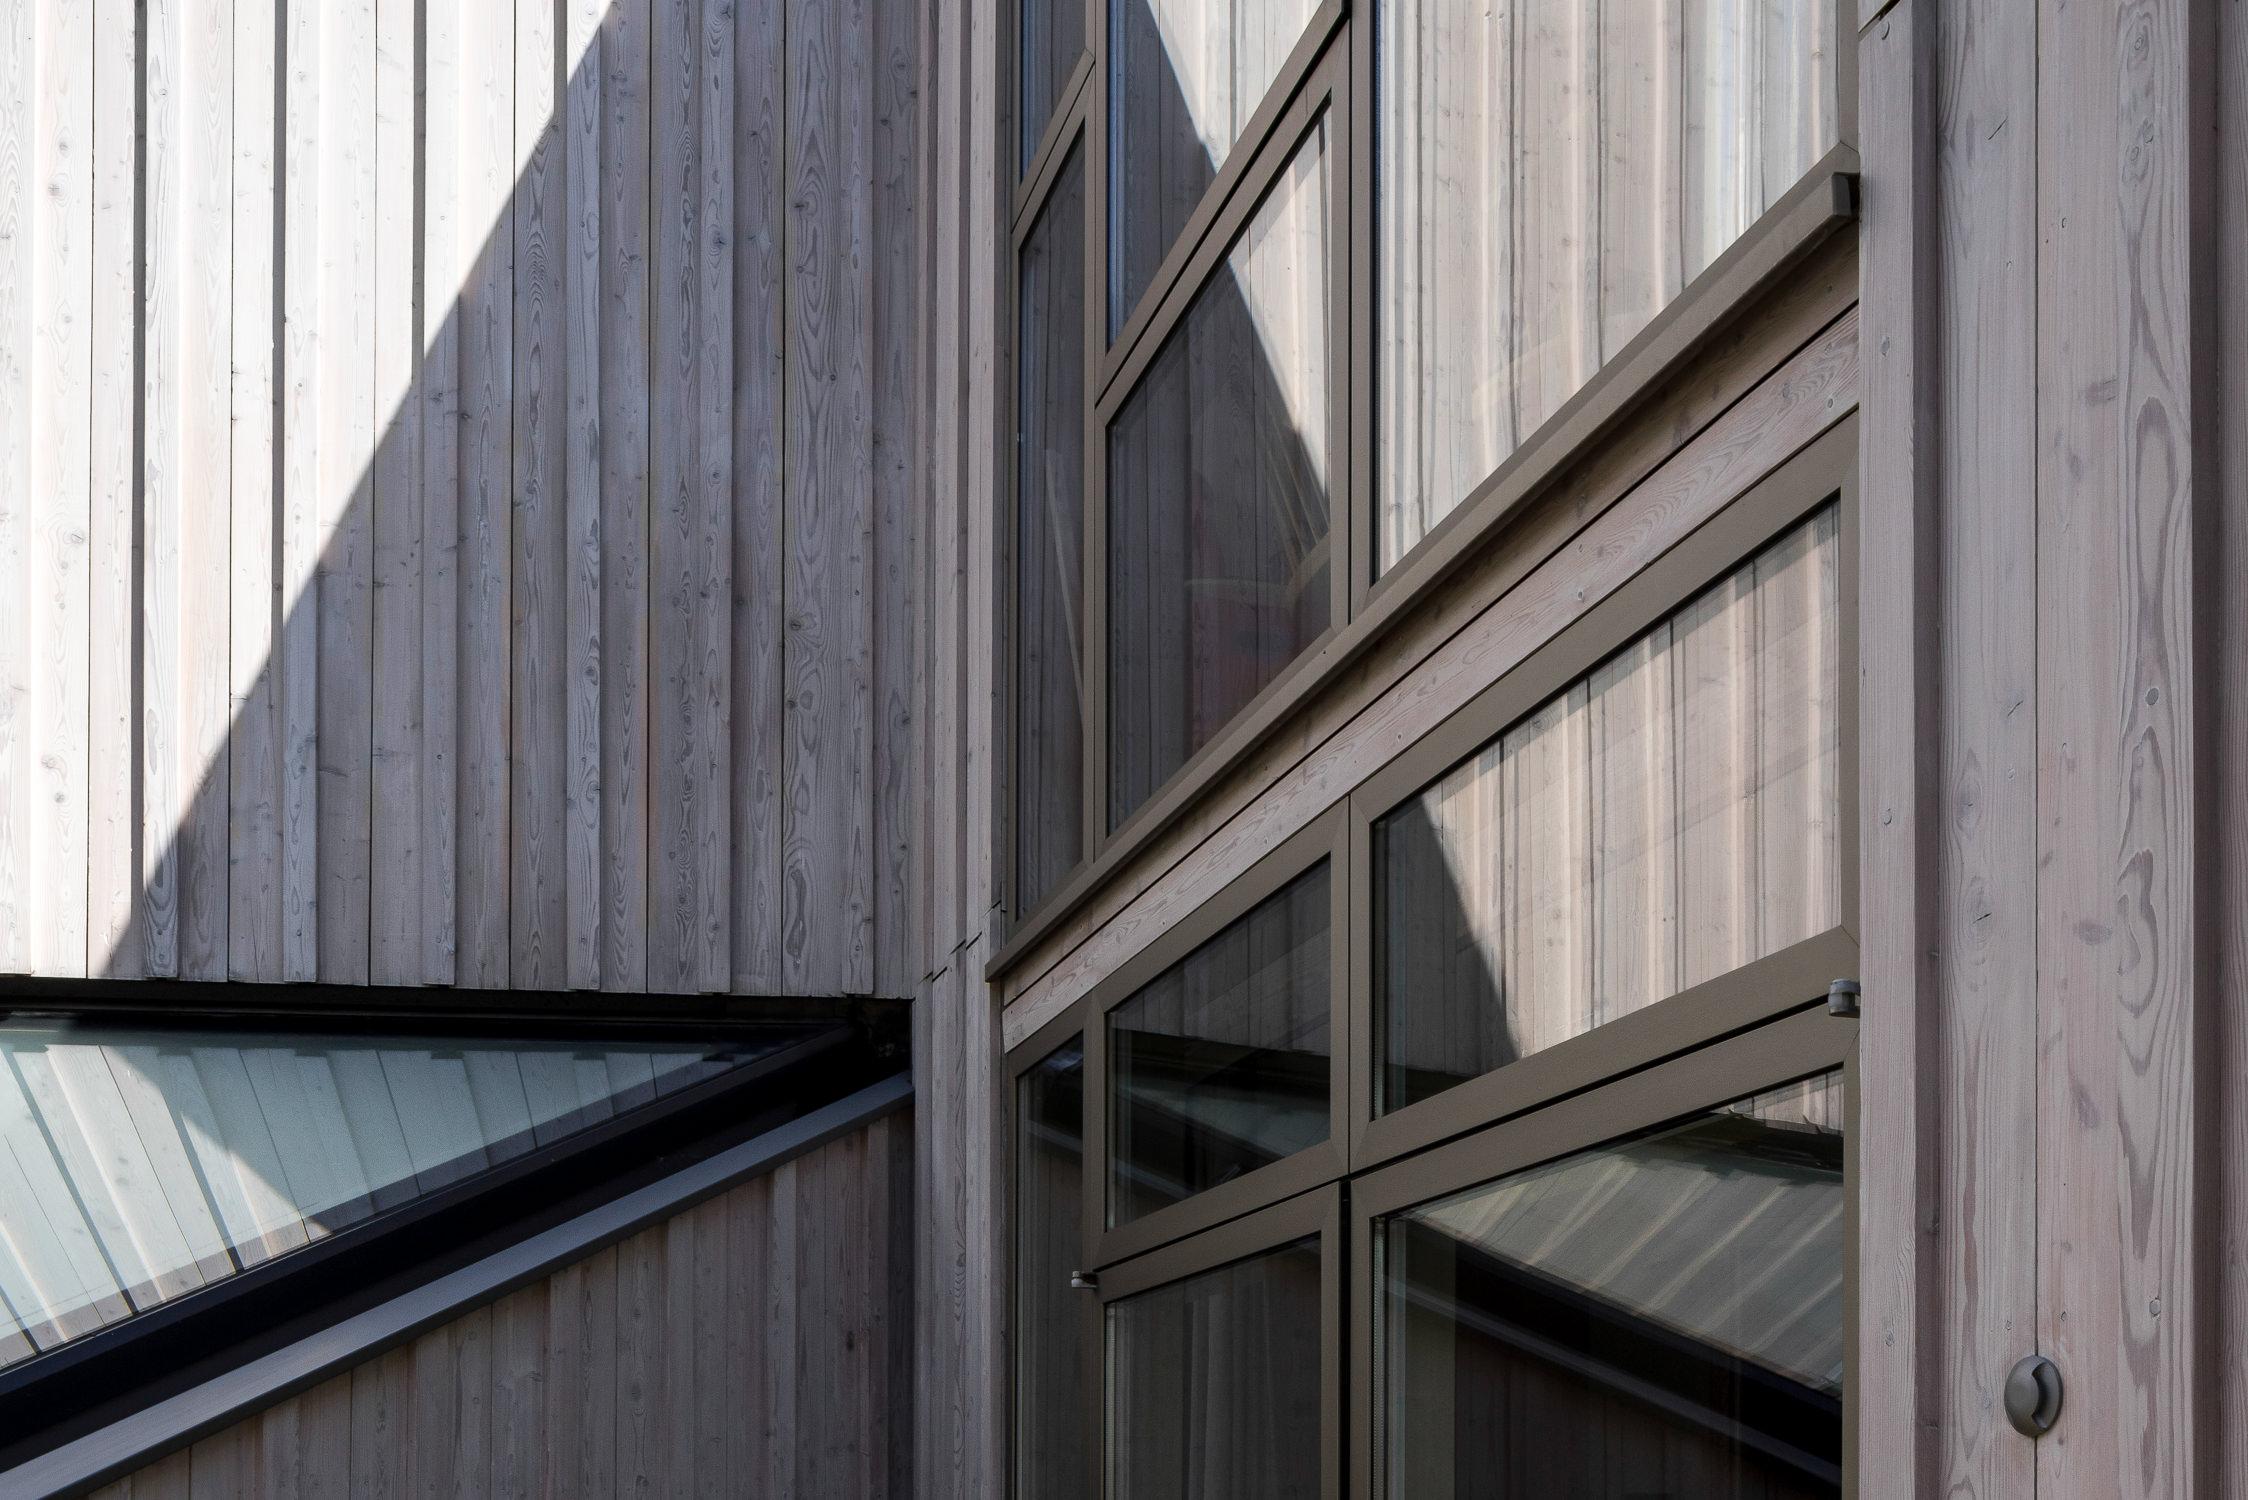 mark-hadden-architecture-photographer-architectuur-interieur-fotografie-london-amsterdam-Church Walk © MH - 056.jpg